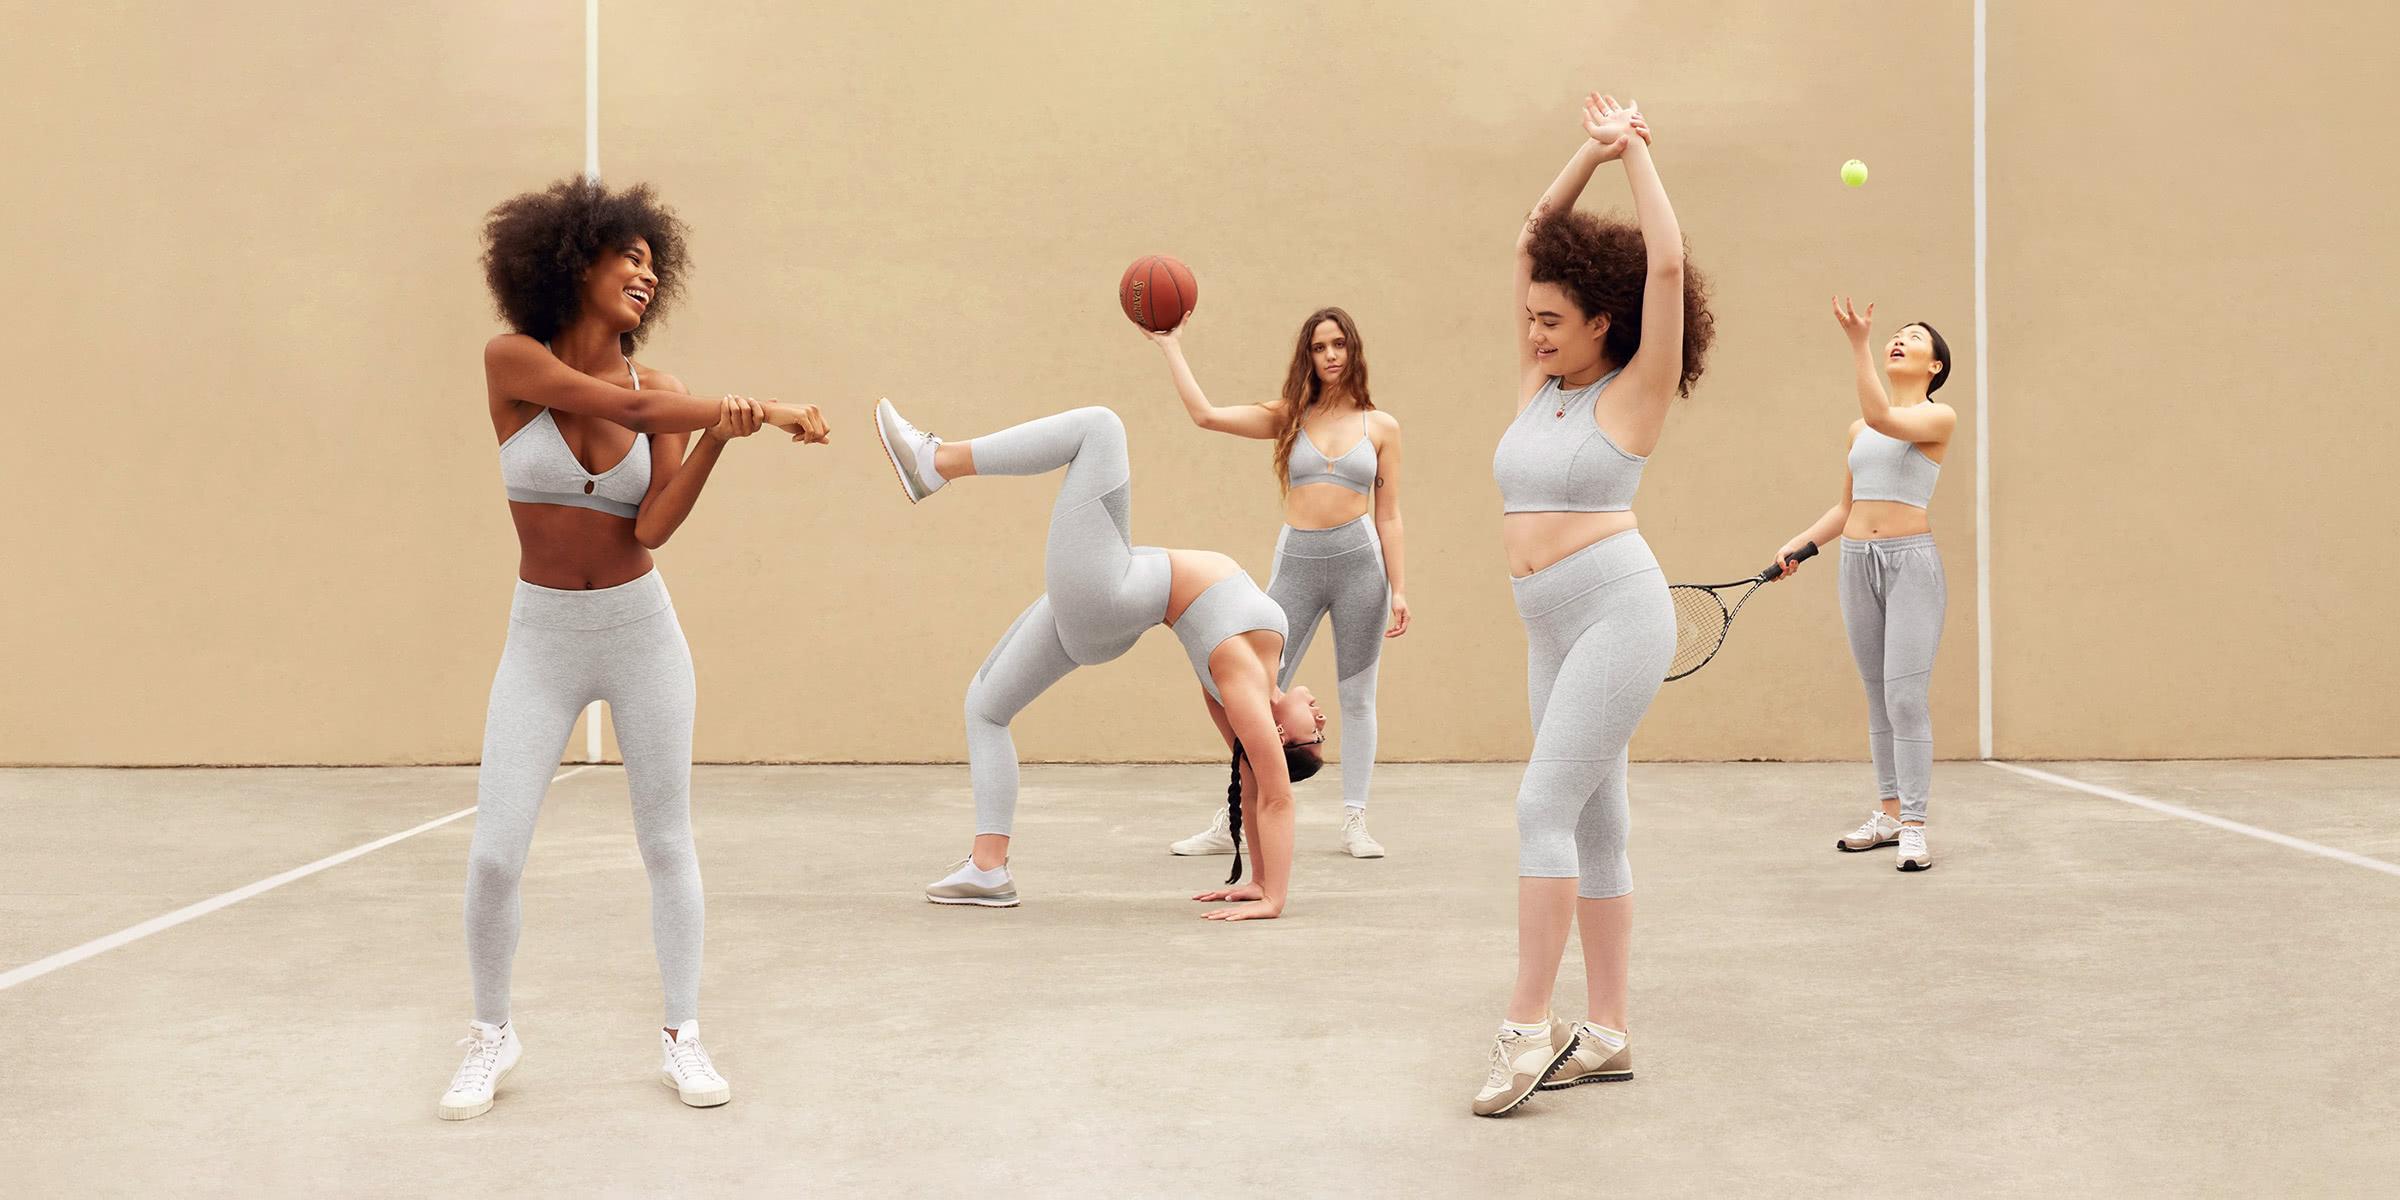 best women activewear athleisure brands - Luxe Digital